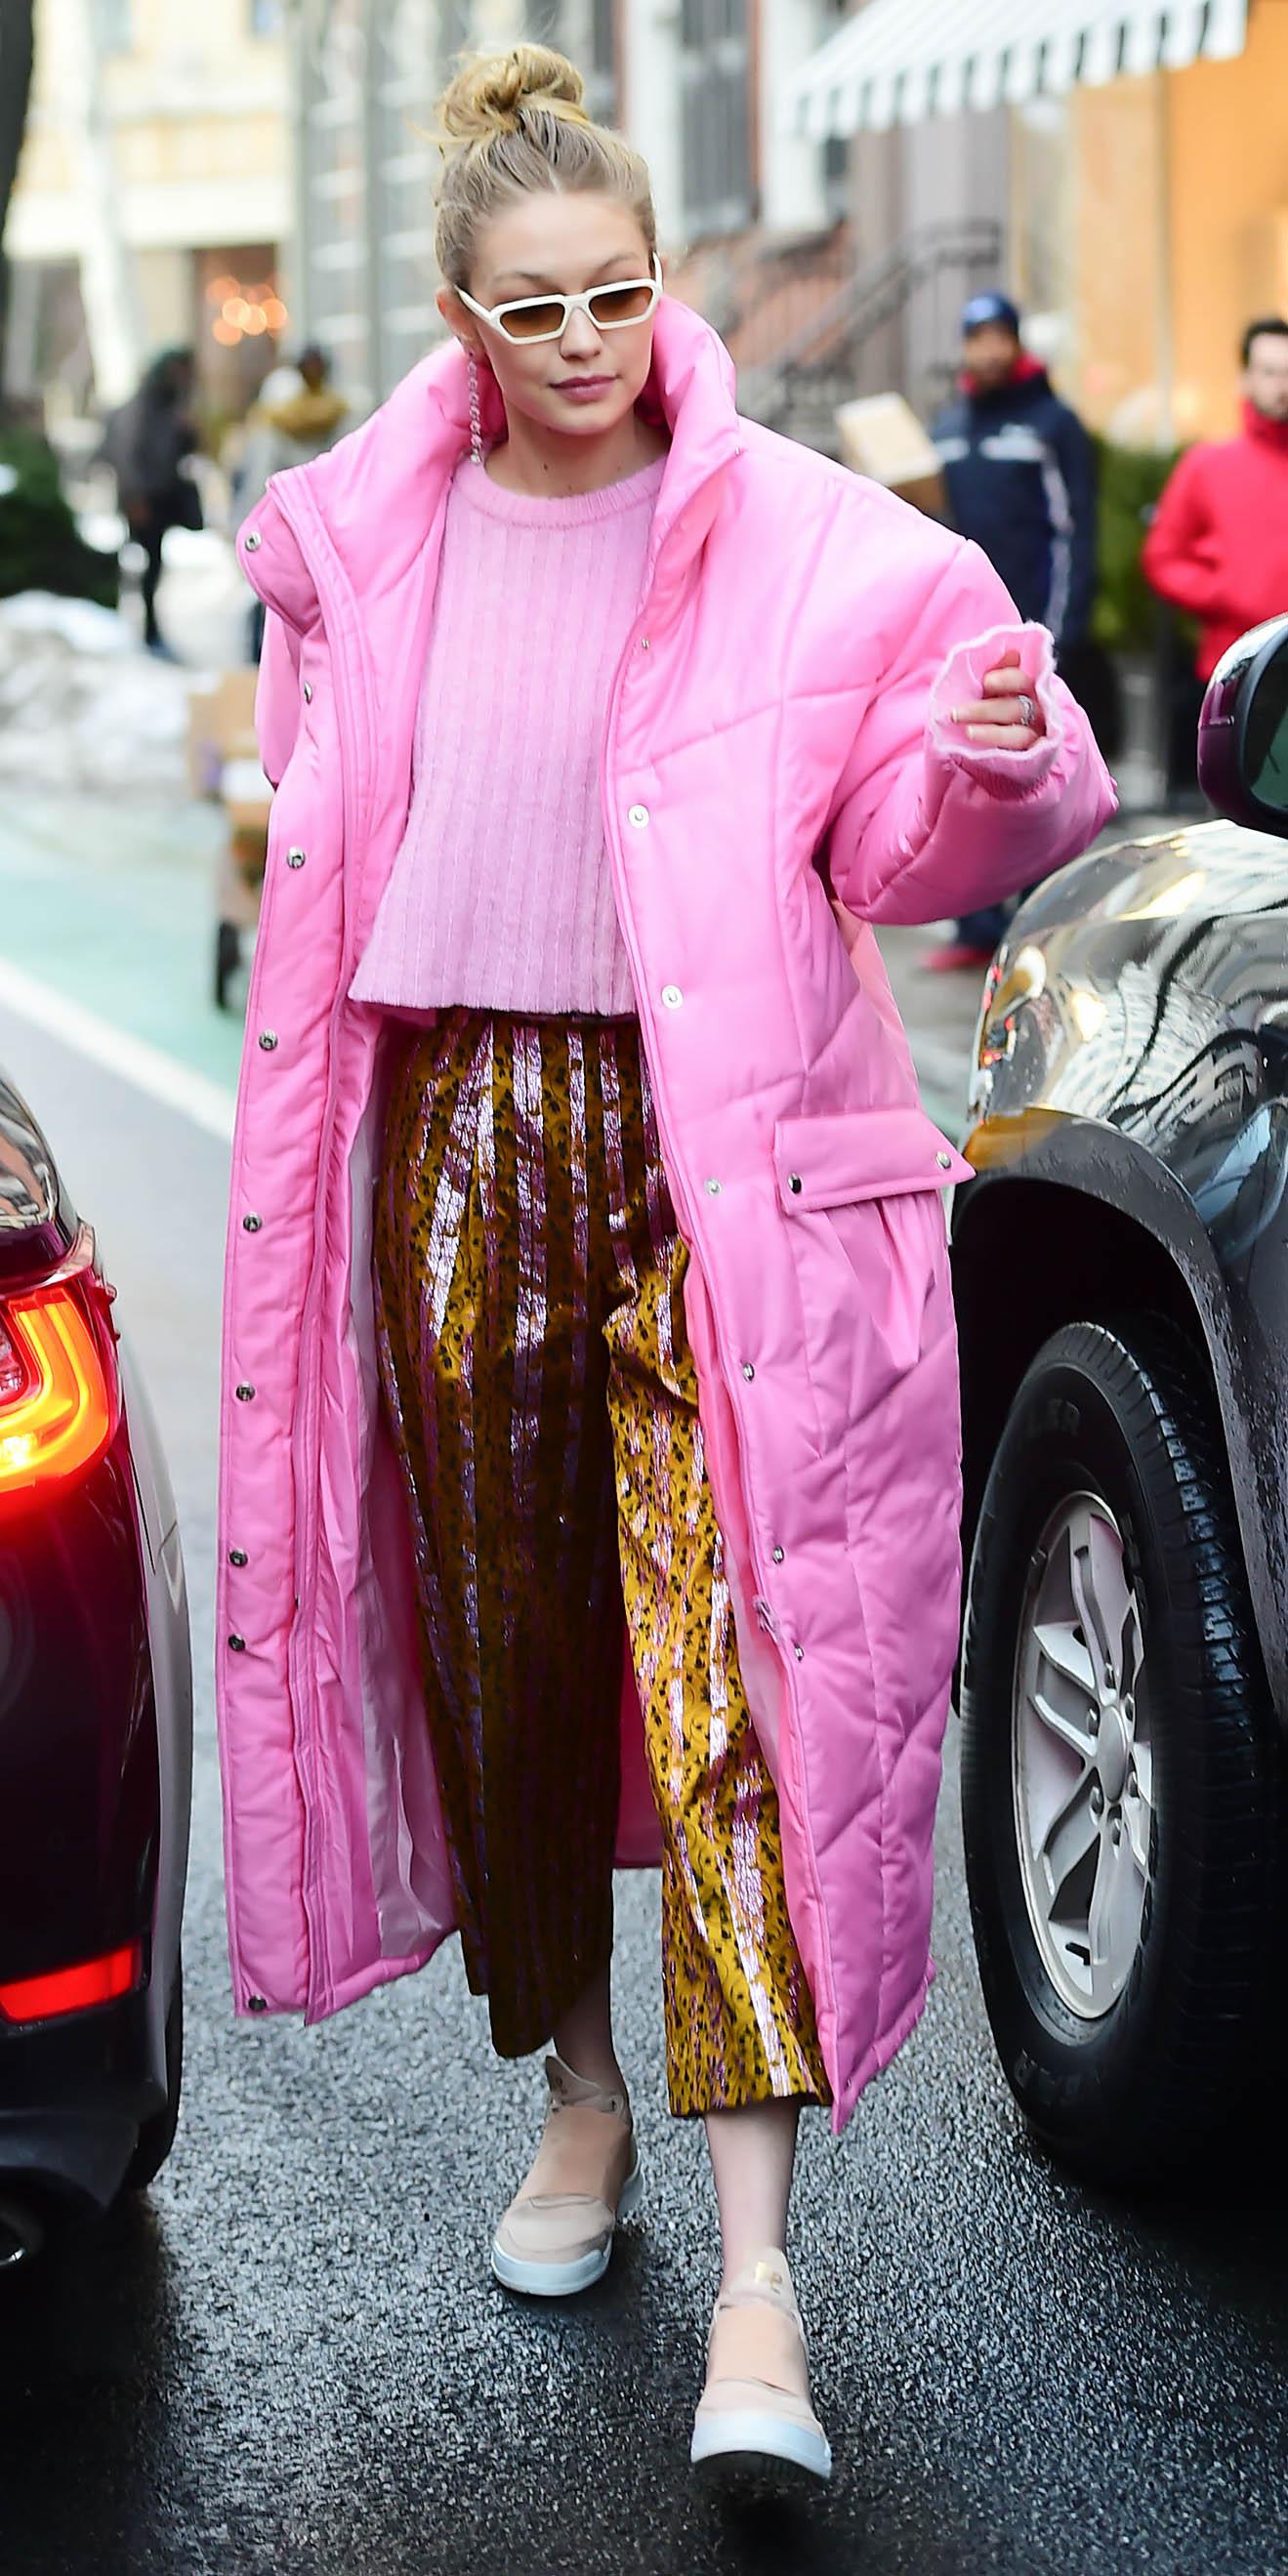 yellow-joggers-pants-tan-shoe-sneakers-pink-light-sweater-blonde-sun-bun-pink-light-jacket-coat-parka-puffer-gigihadid-fall-winter-weekend.jpg